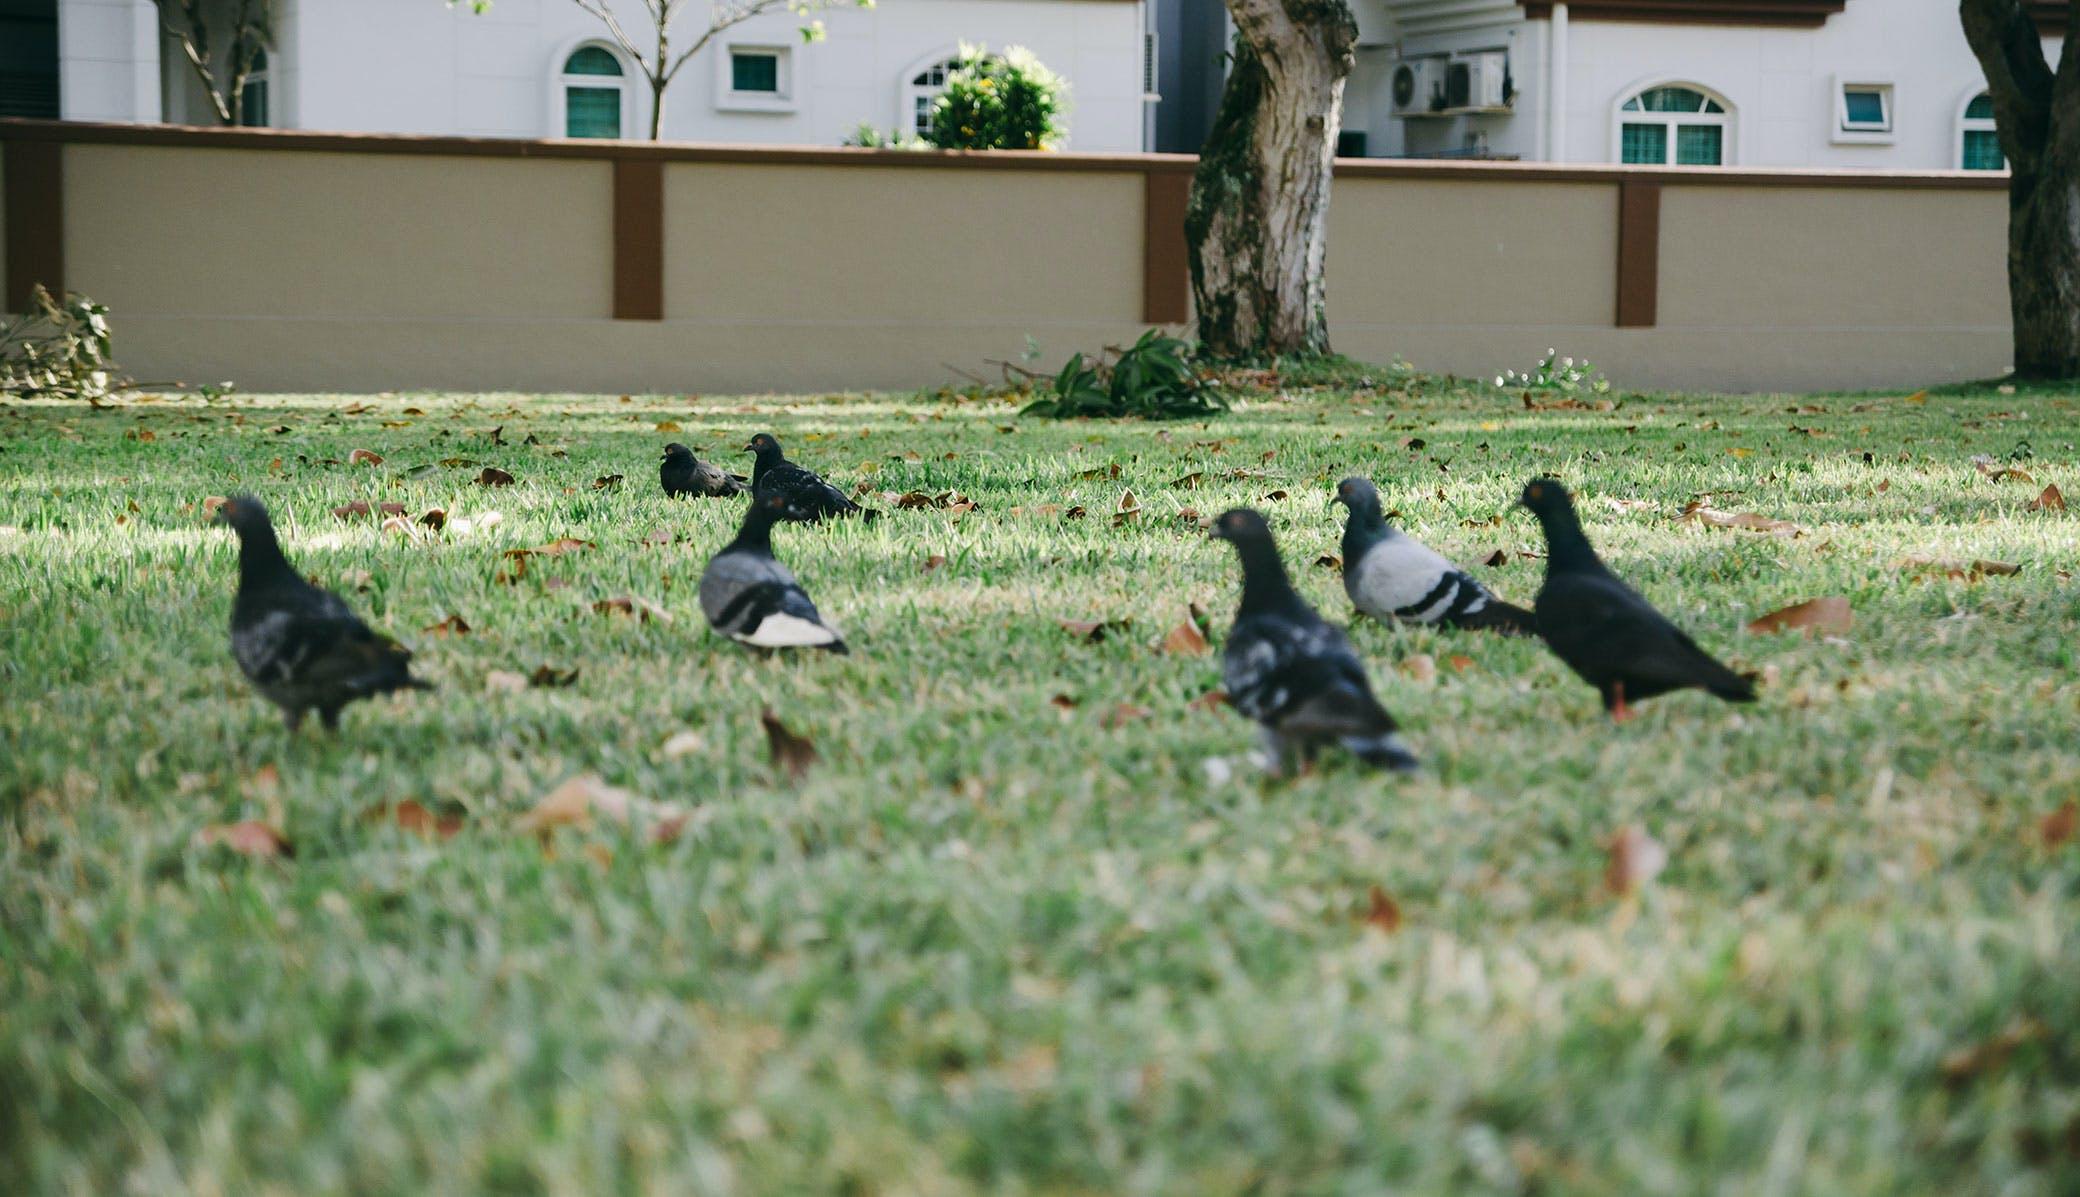 Free stock photo of grass, lawn, animals, birds